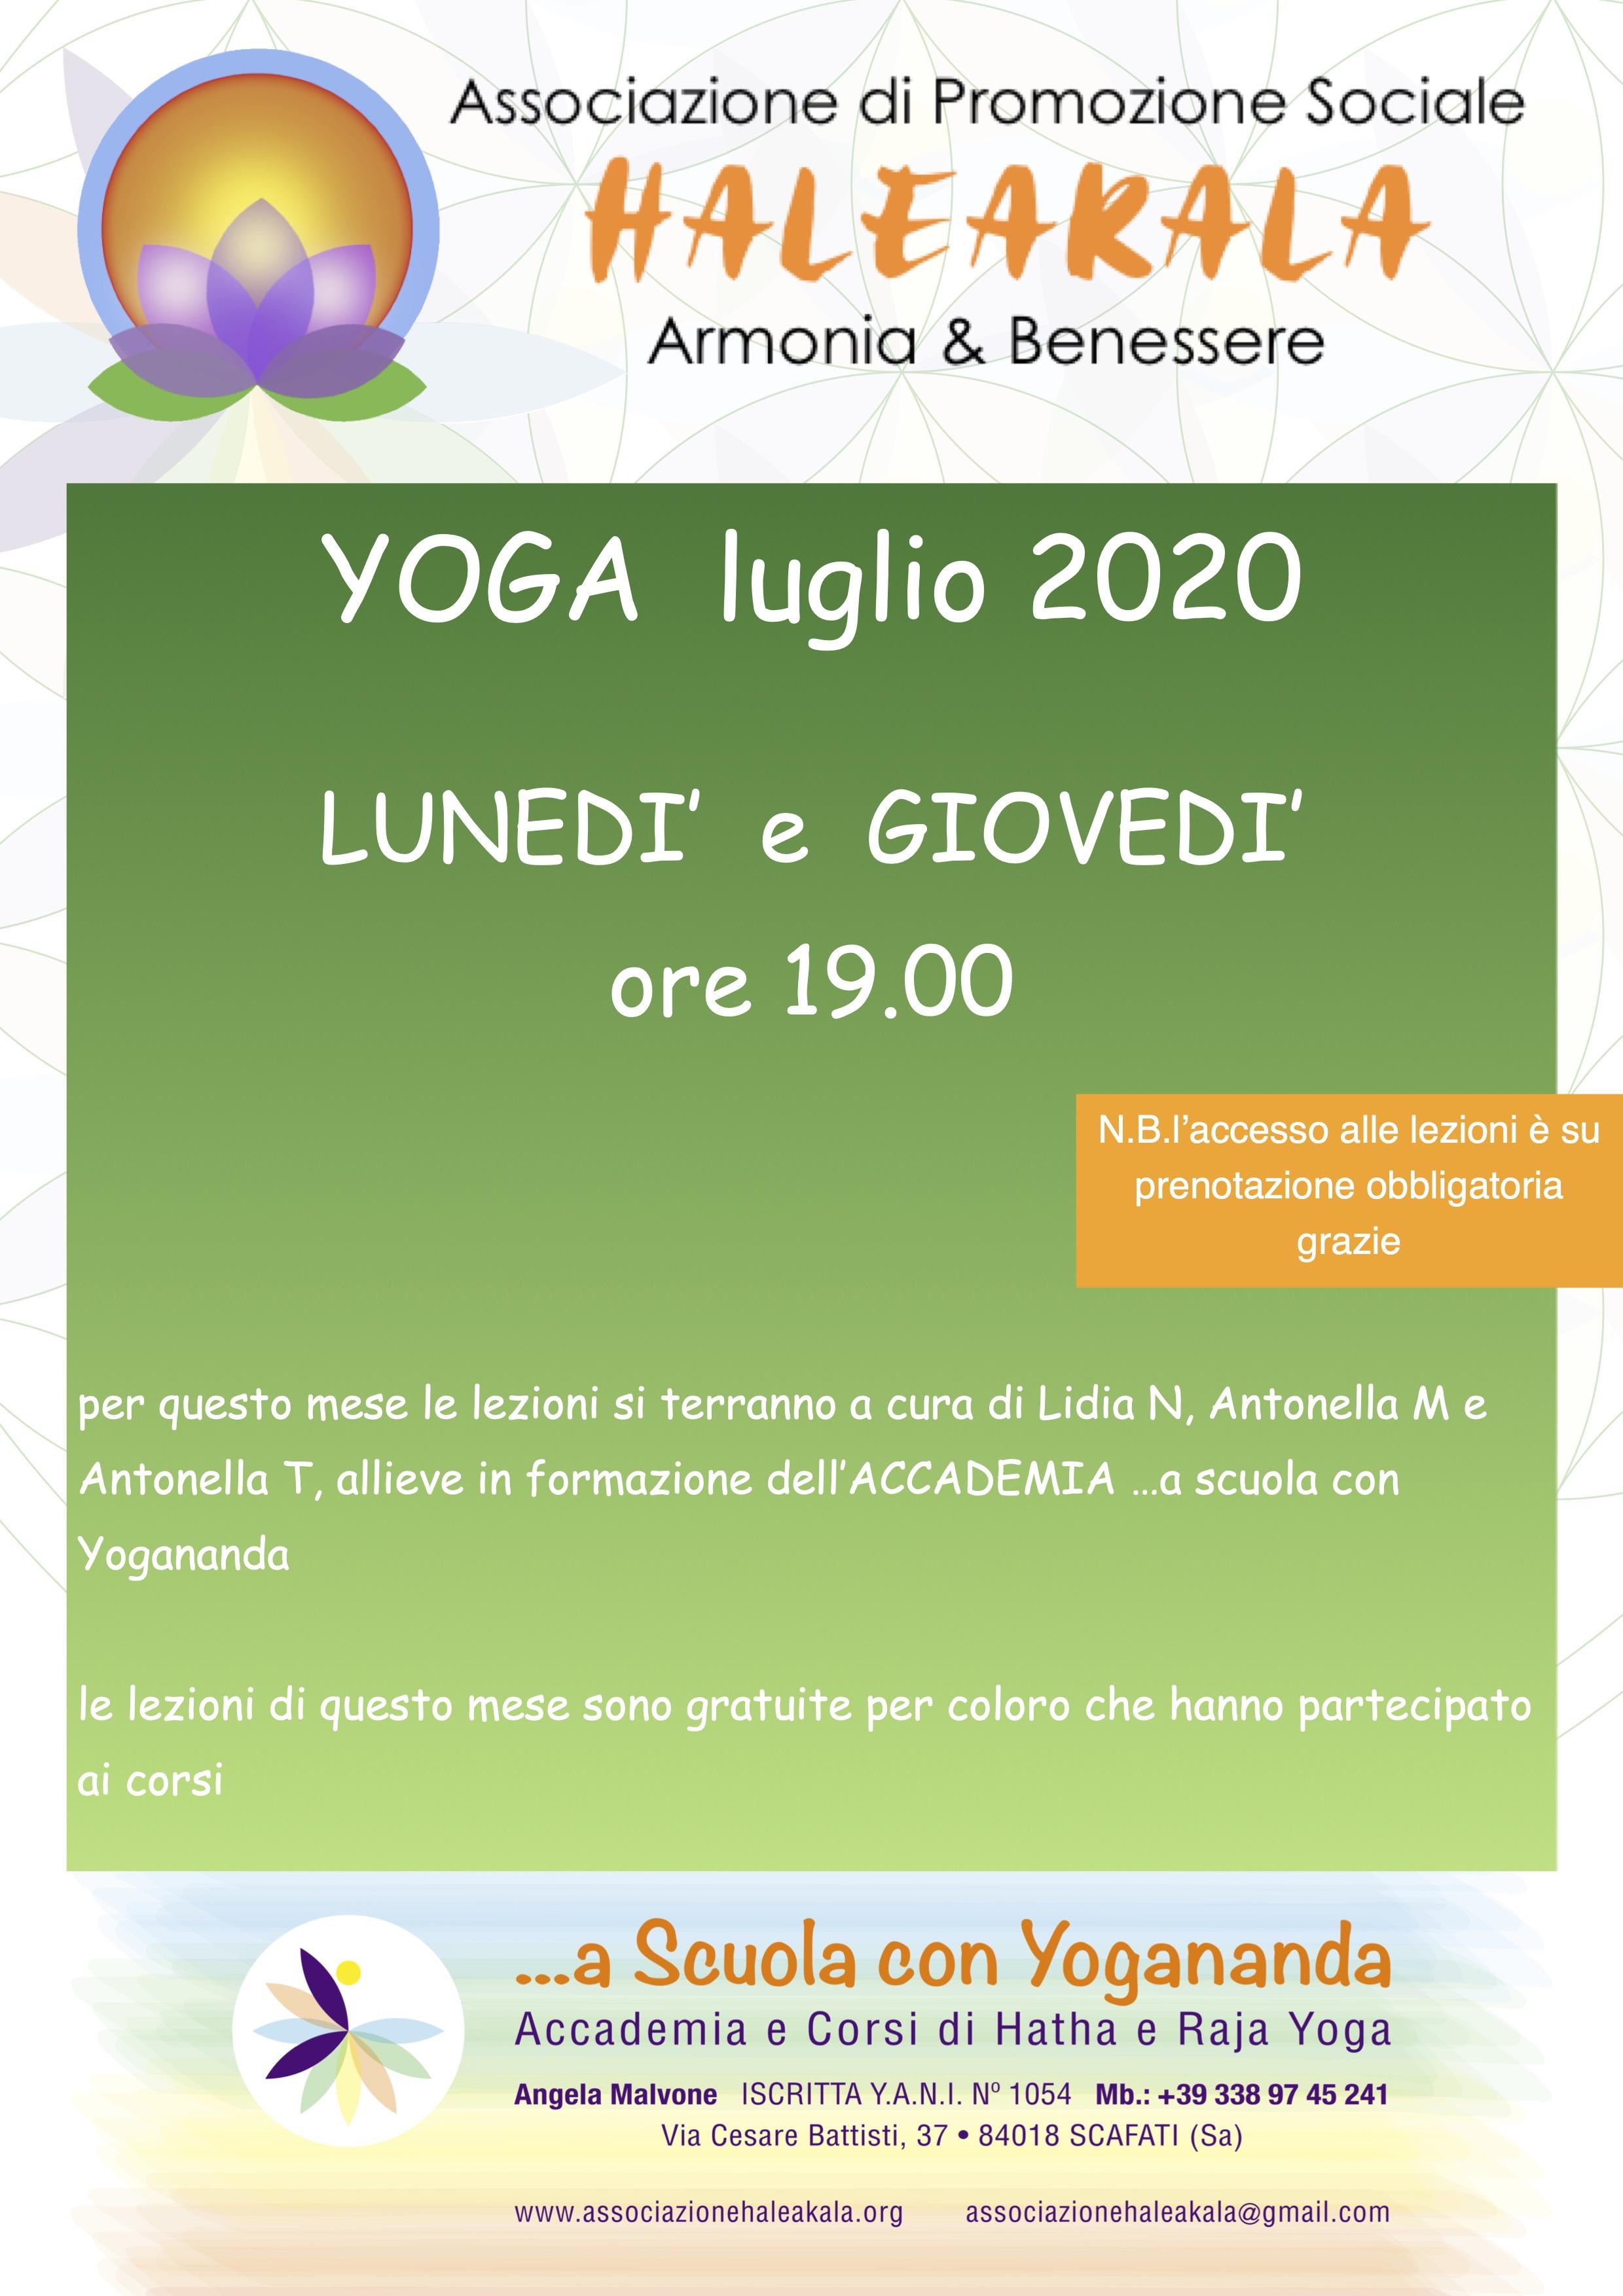 locandina yoga luglio 2020 .jpg